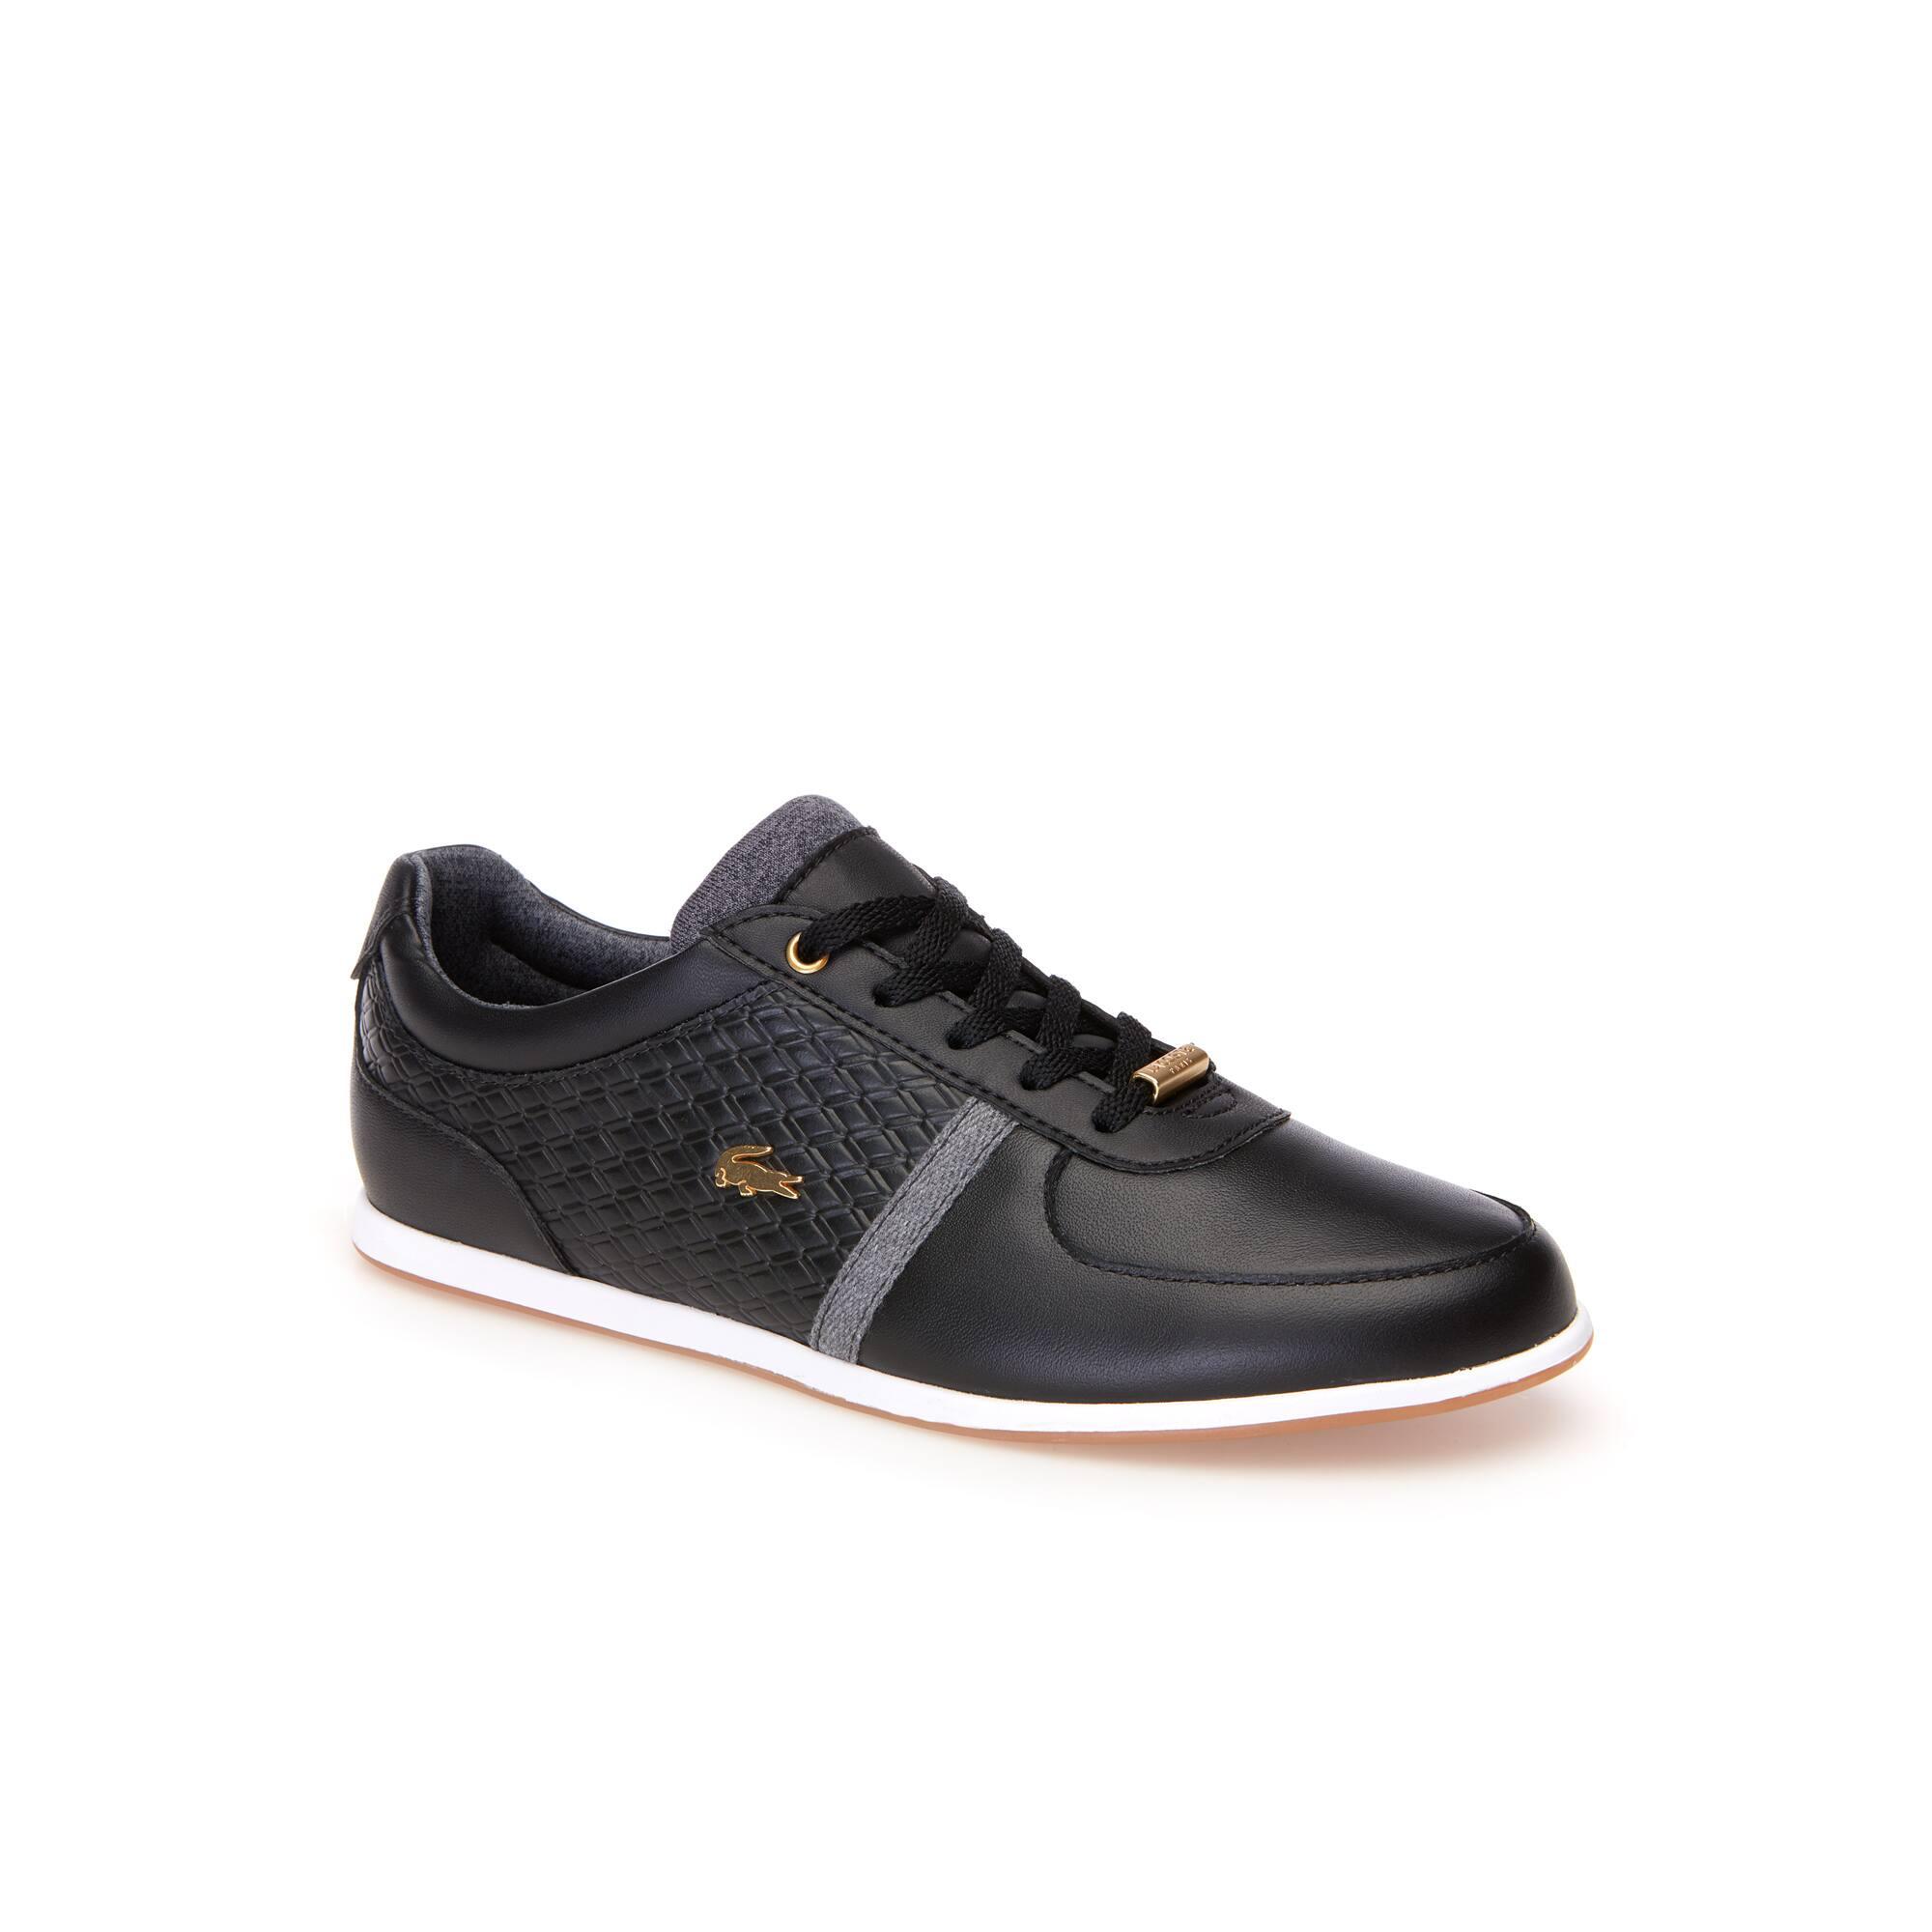 Stivali Lacoste Da Città Q18pwur Scarpe Donna Sneaker 6qHdx7w6RF